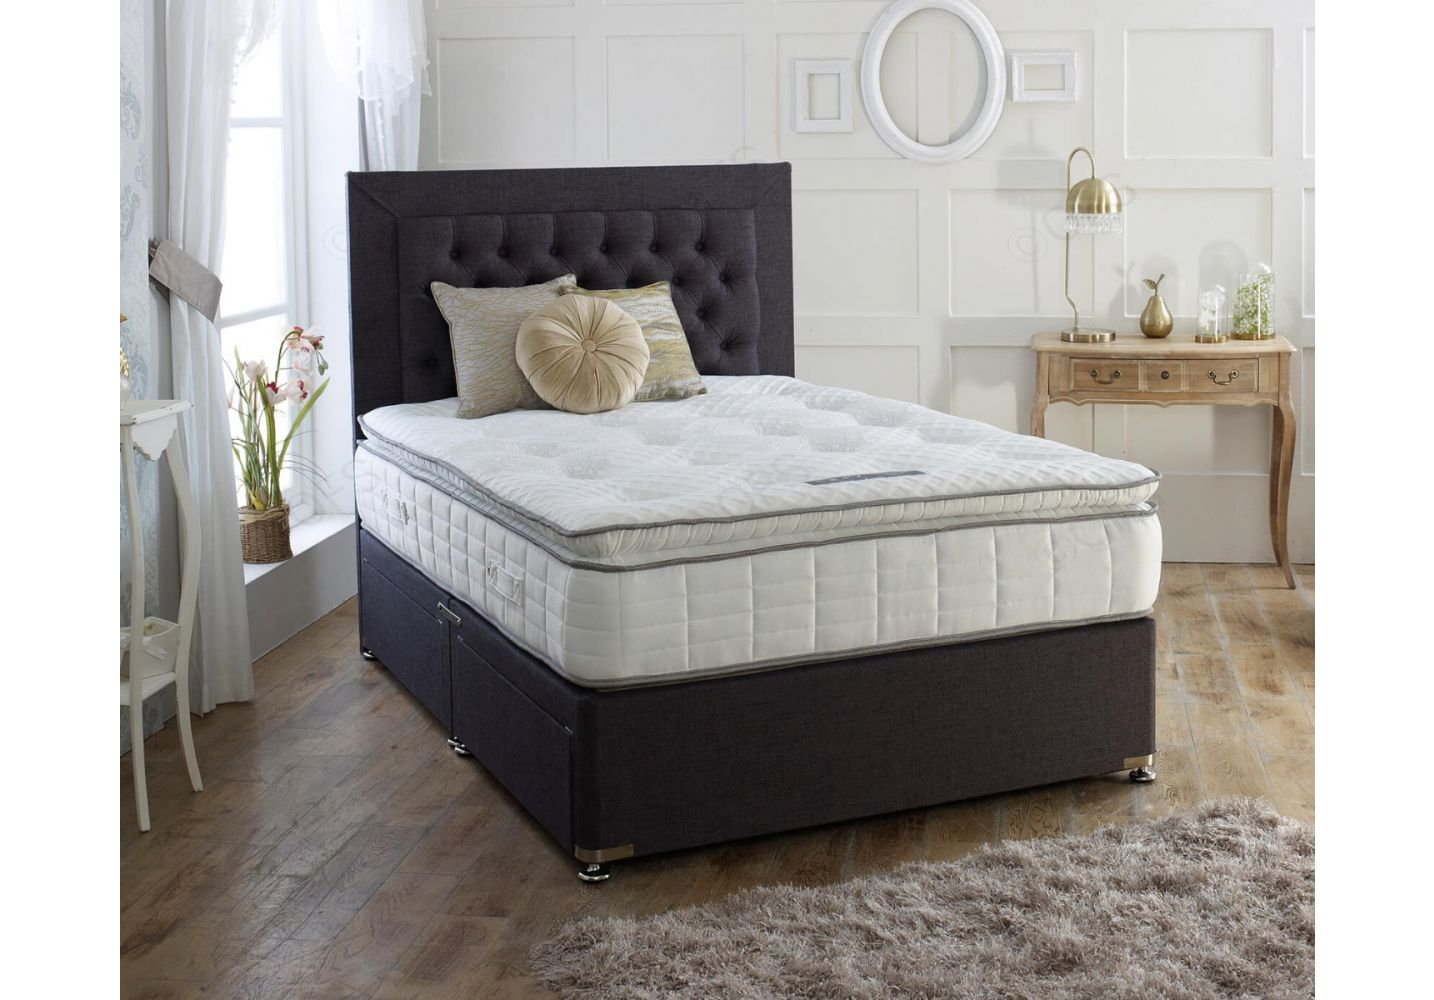 Beds Glasgow - Tiree Divan Bed Set